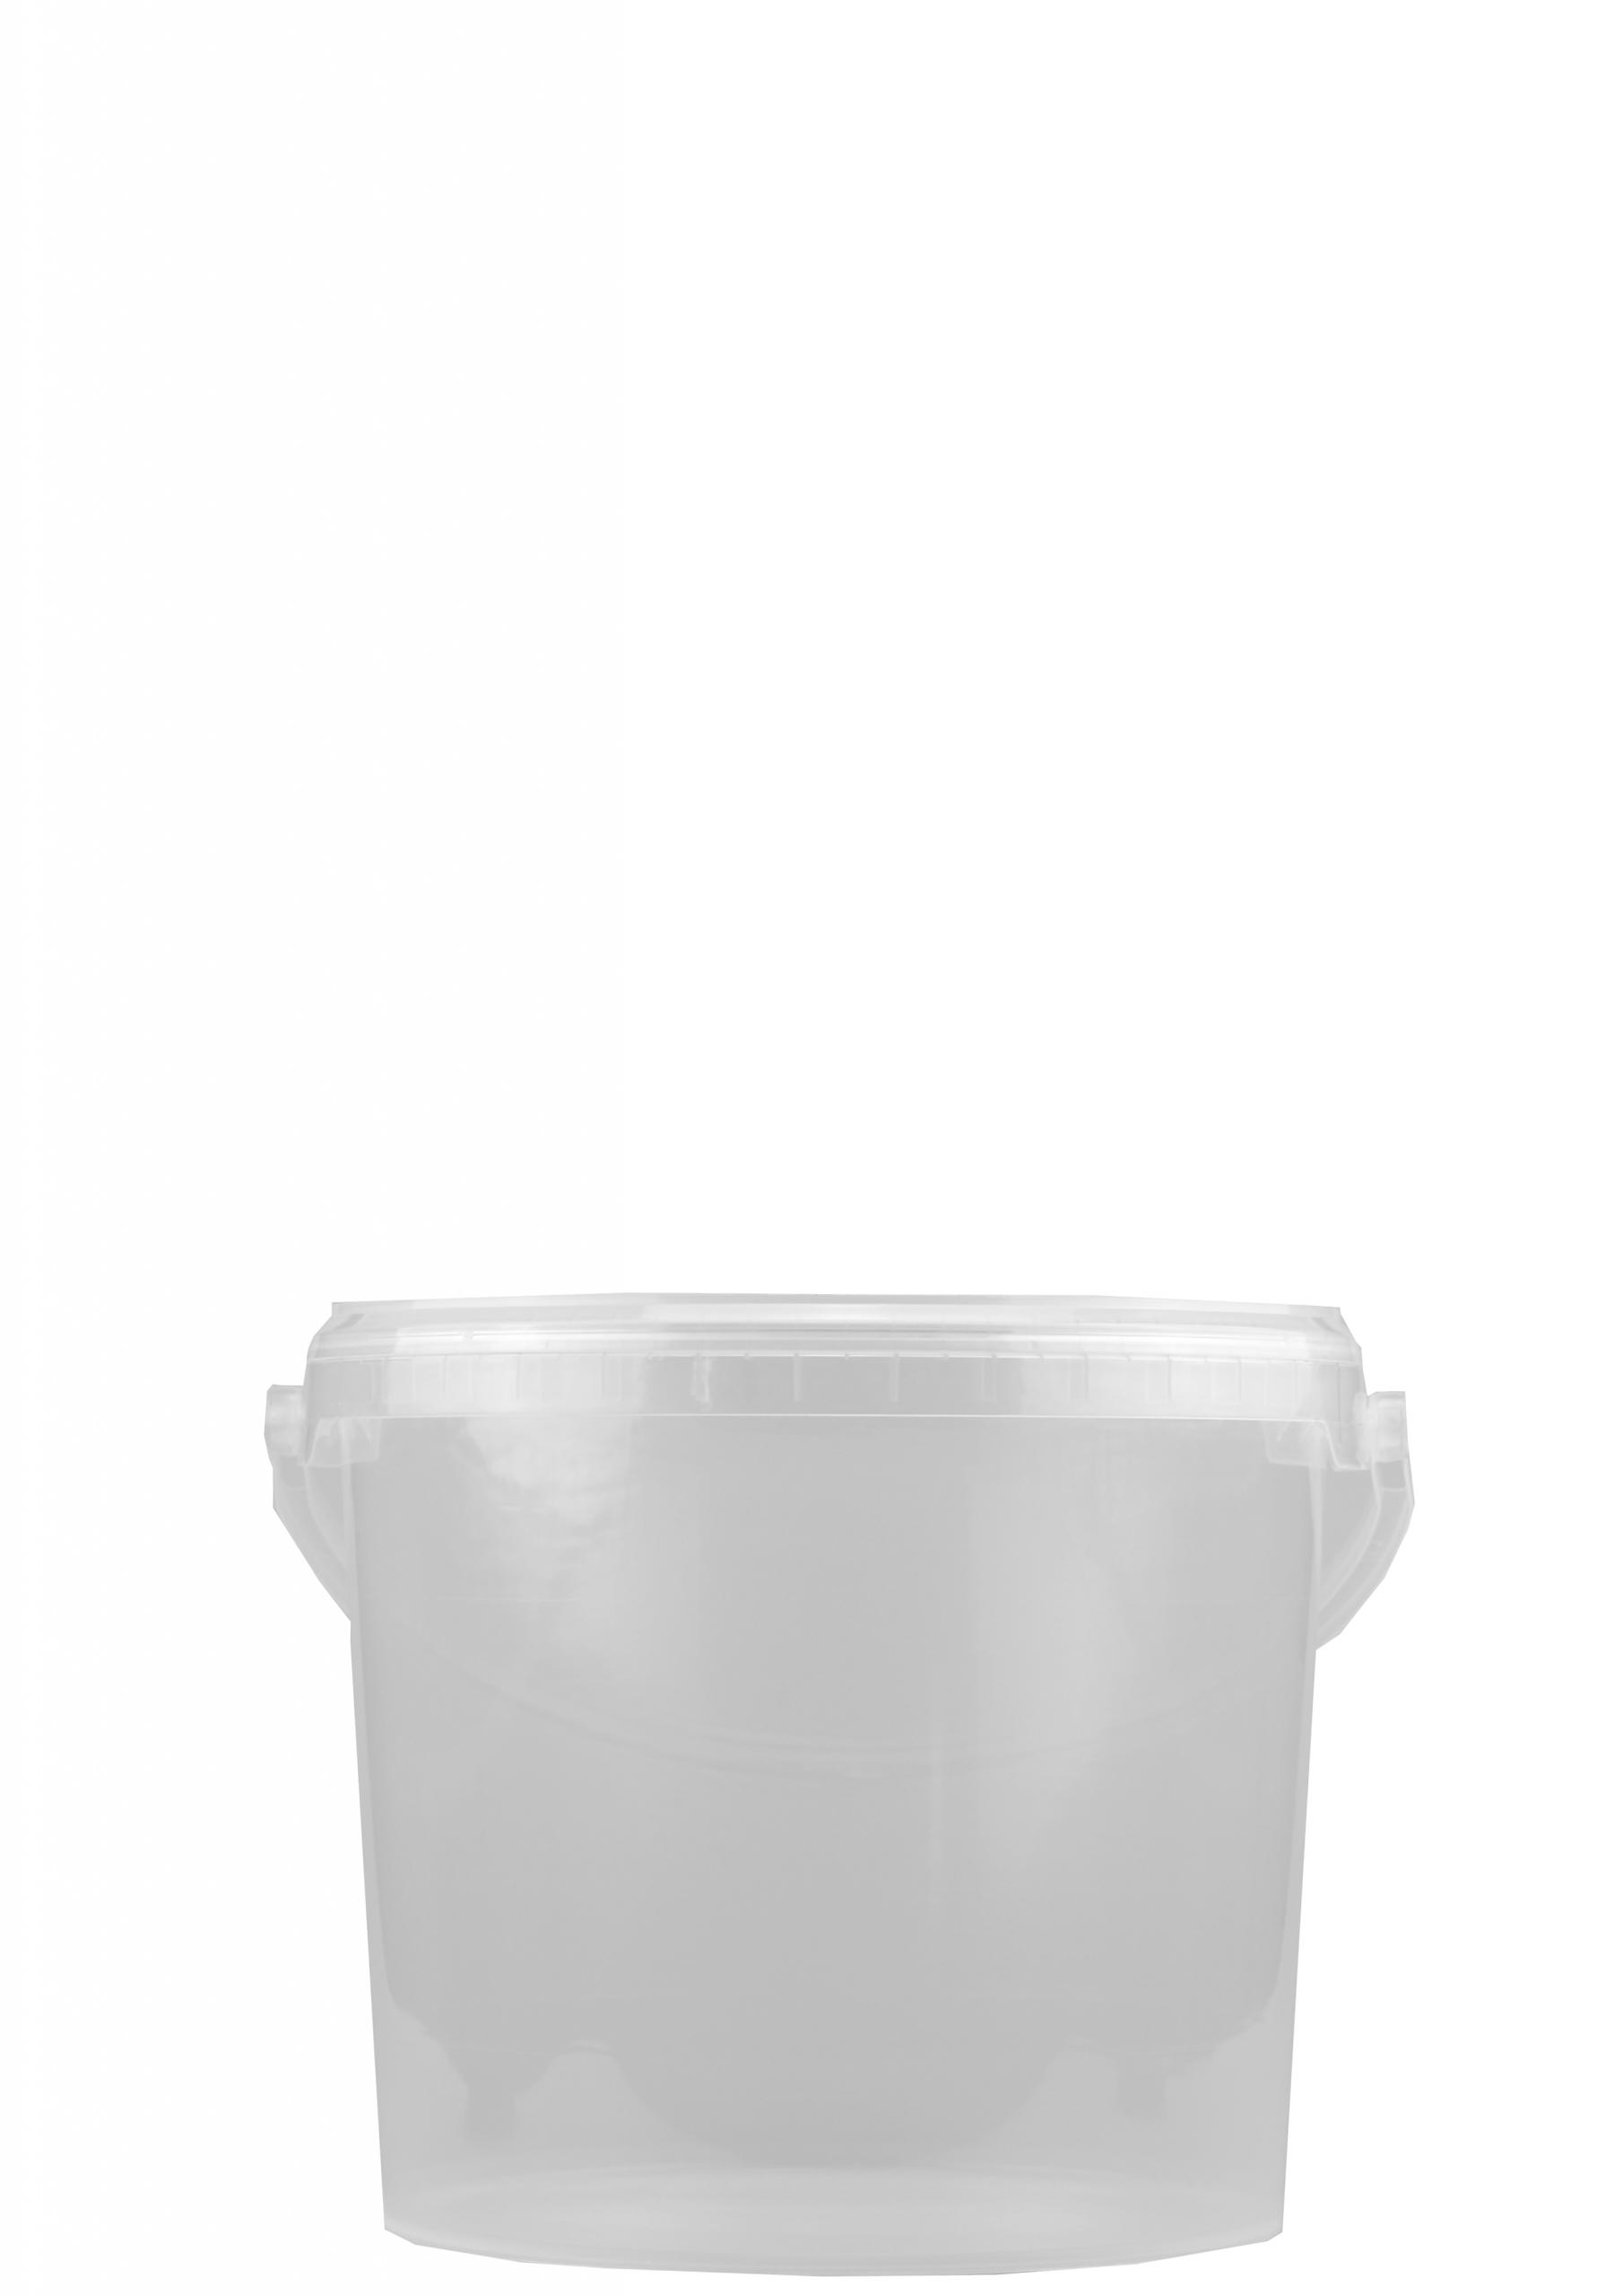 5.7 liter bucket